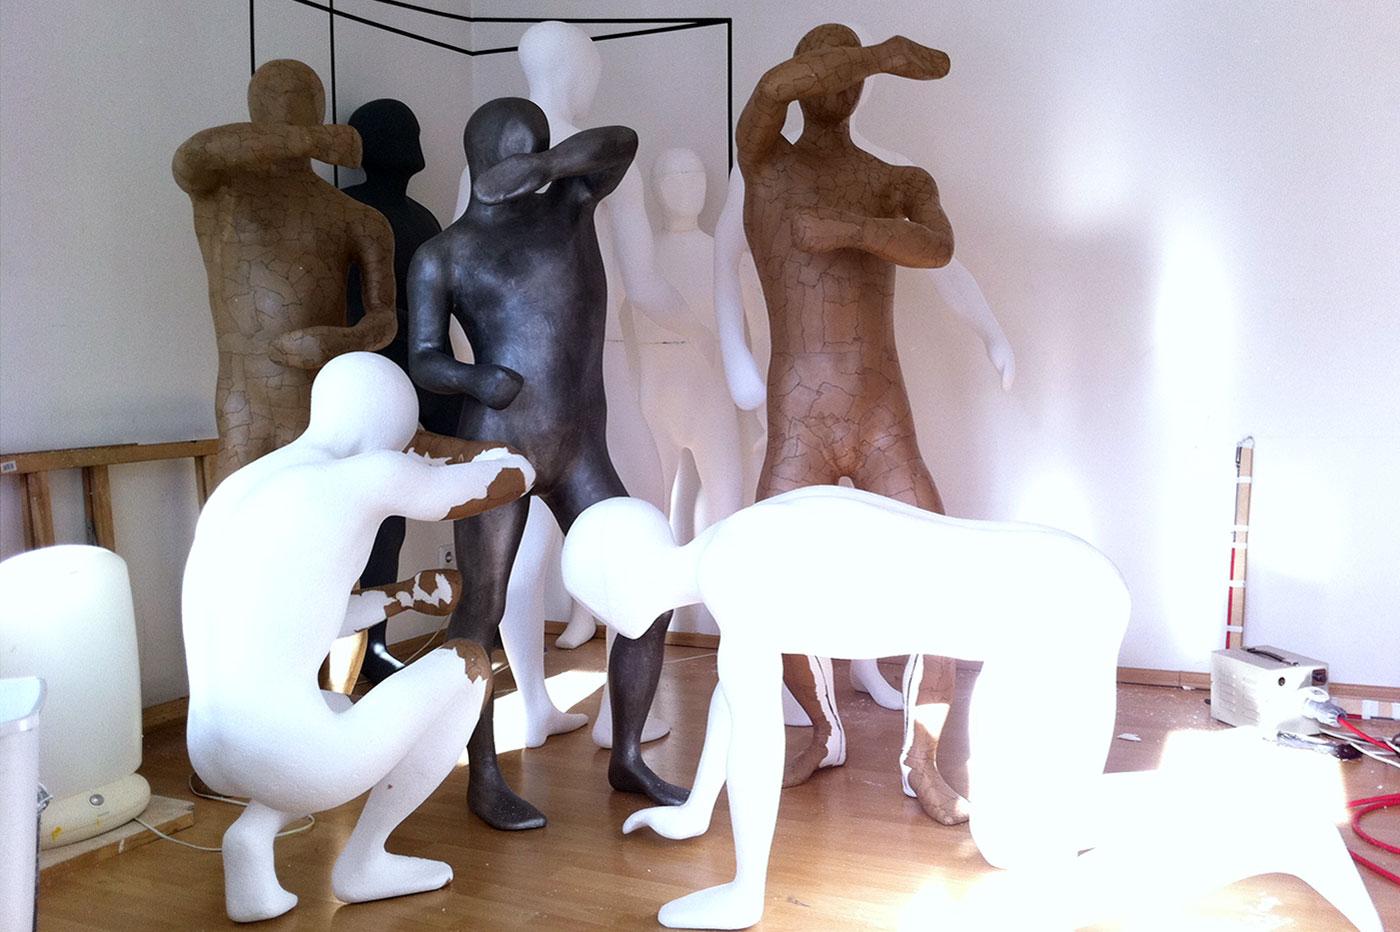 FIGURINE CIRCLE of 10 life-size figures,  © 2011 styrofoam, lined with paper, aluminium powder, acrylic paint, steel framework